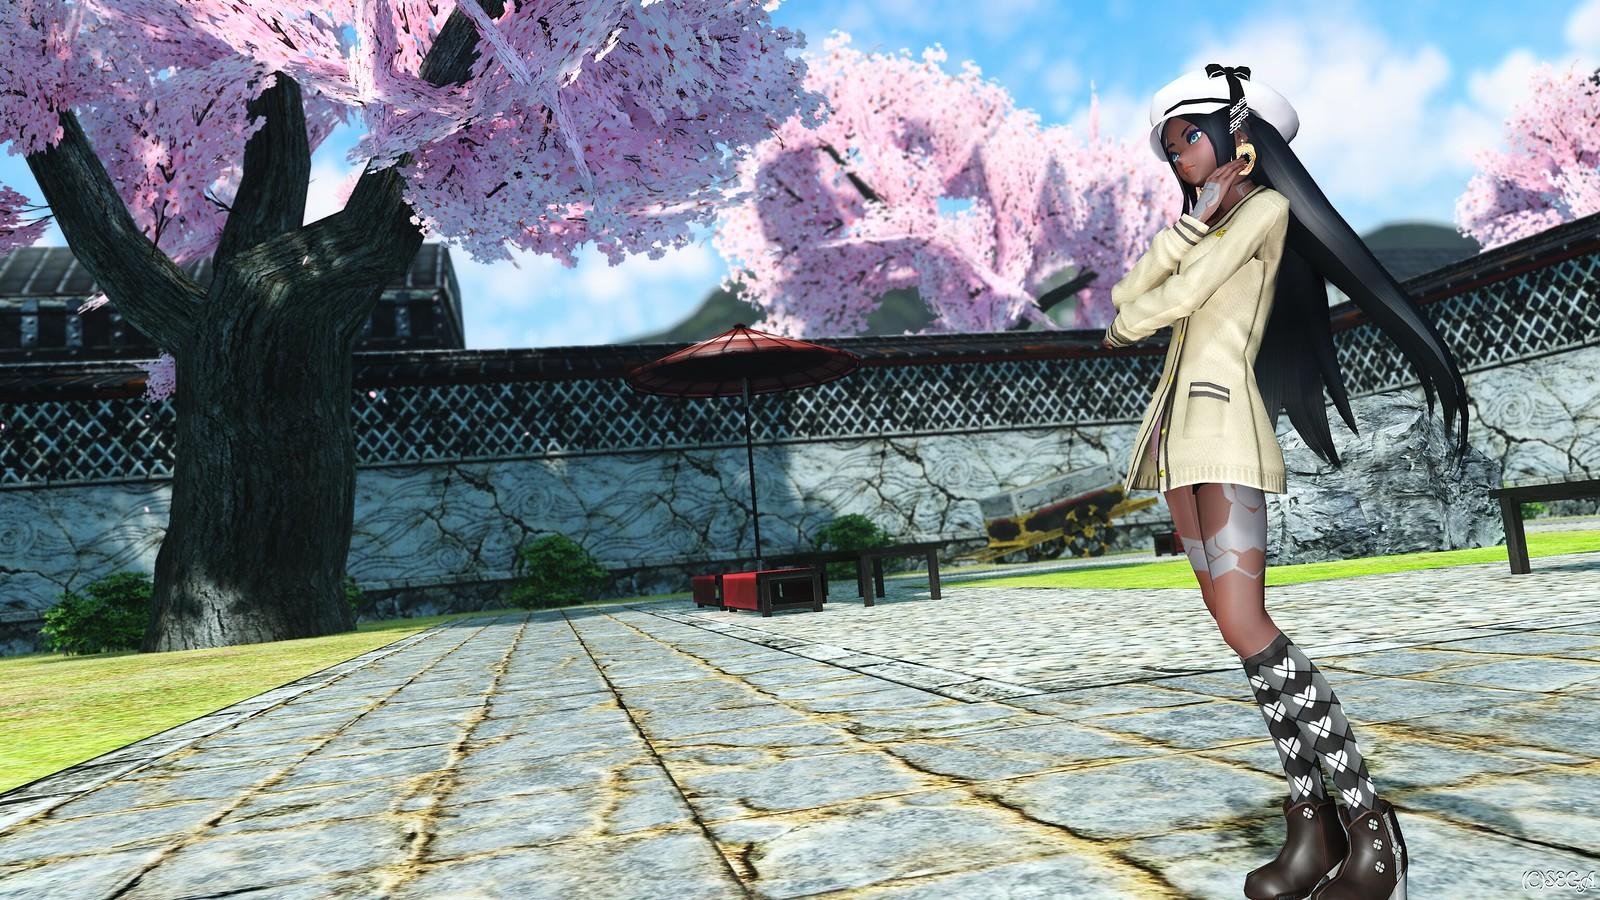 Phantasy Star Online 2 Screenshot 2021.04.04 - 02.25.52.77